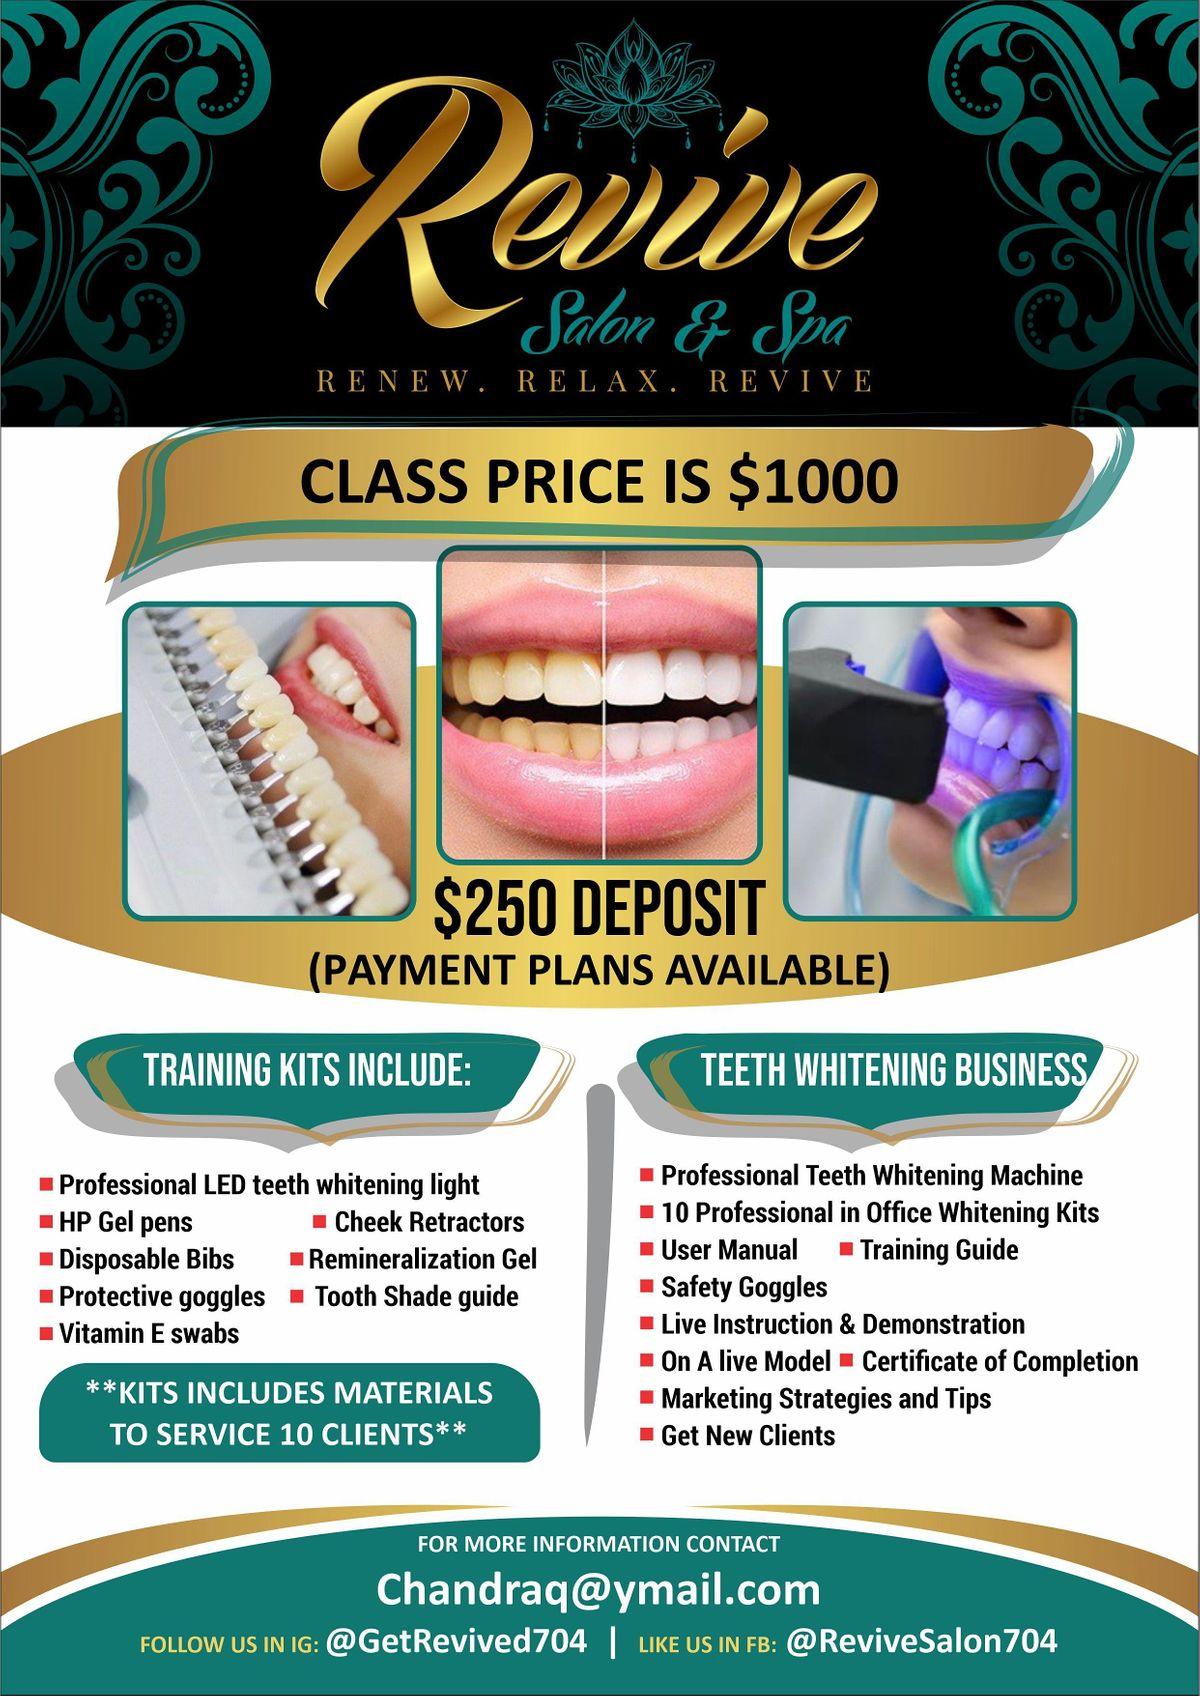 Revive Salon & Spa \u201cTeeth Whitening Certification\u201d Class